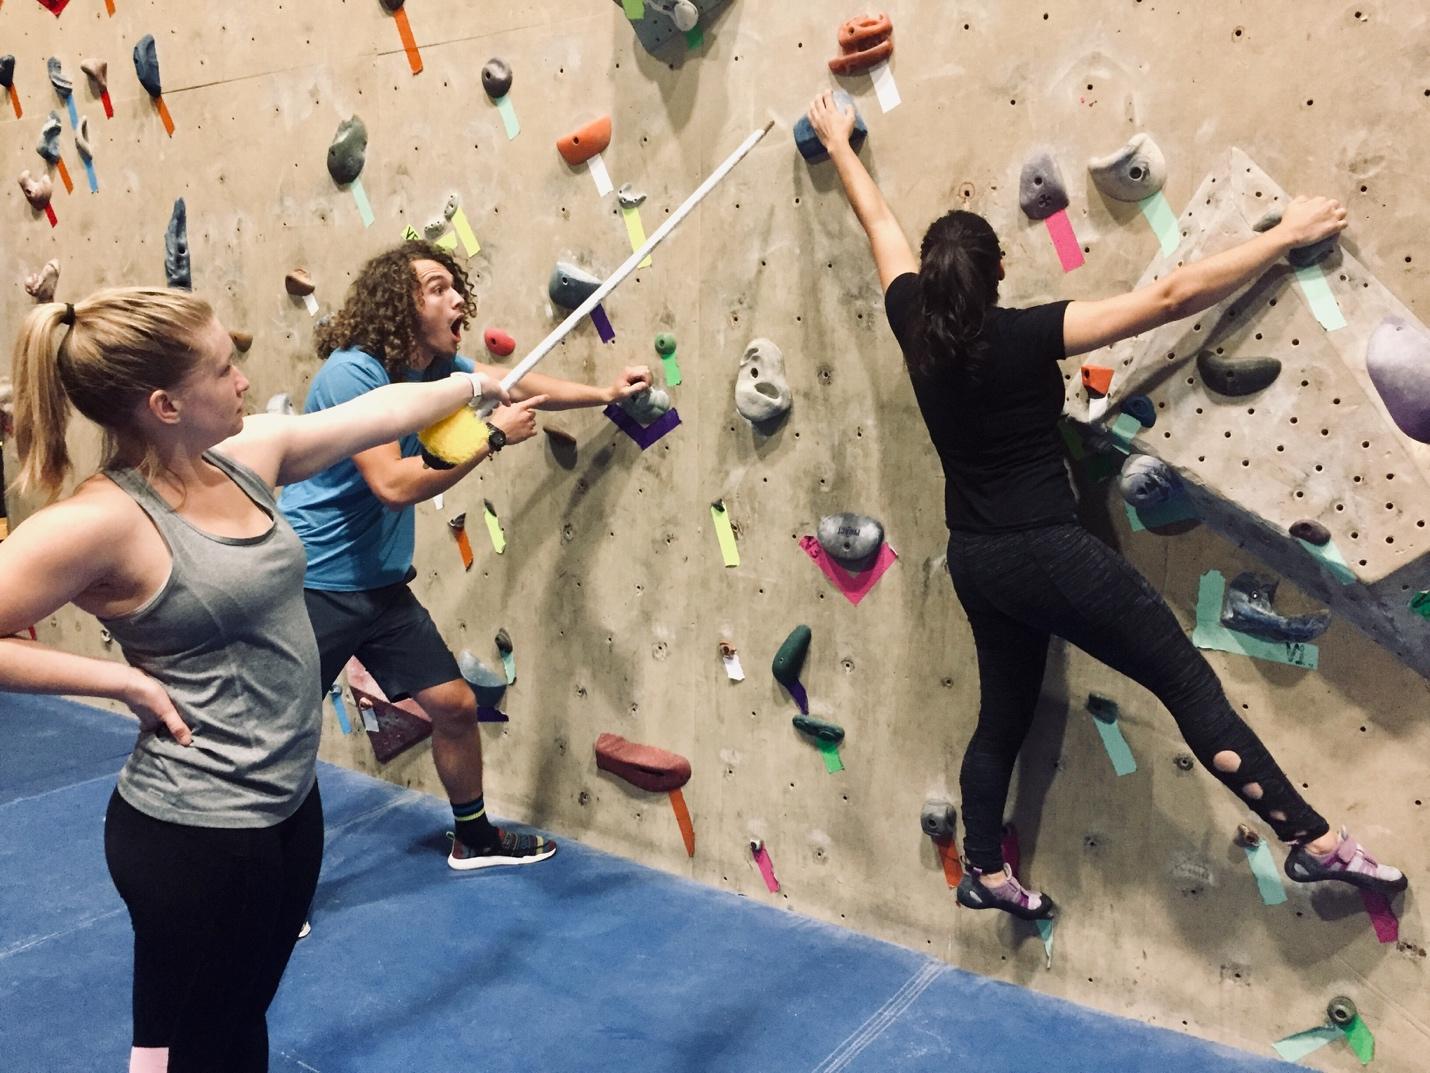 Three Climbers Playing Stick On Climbing Game